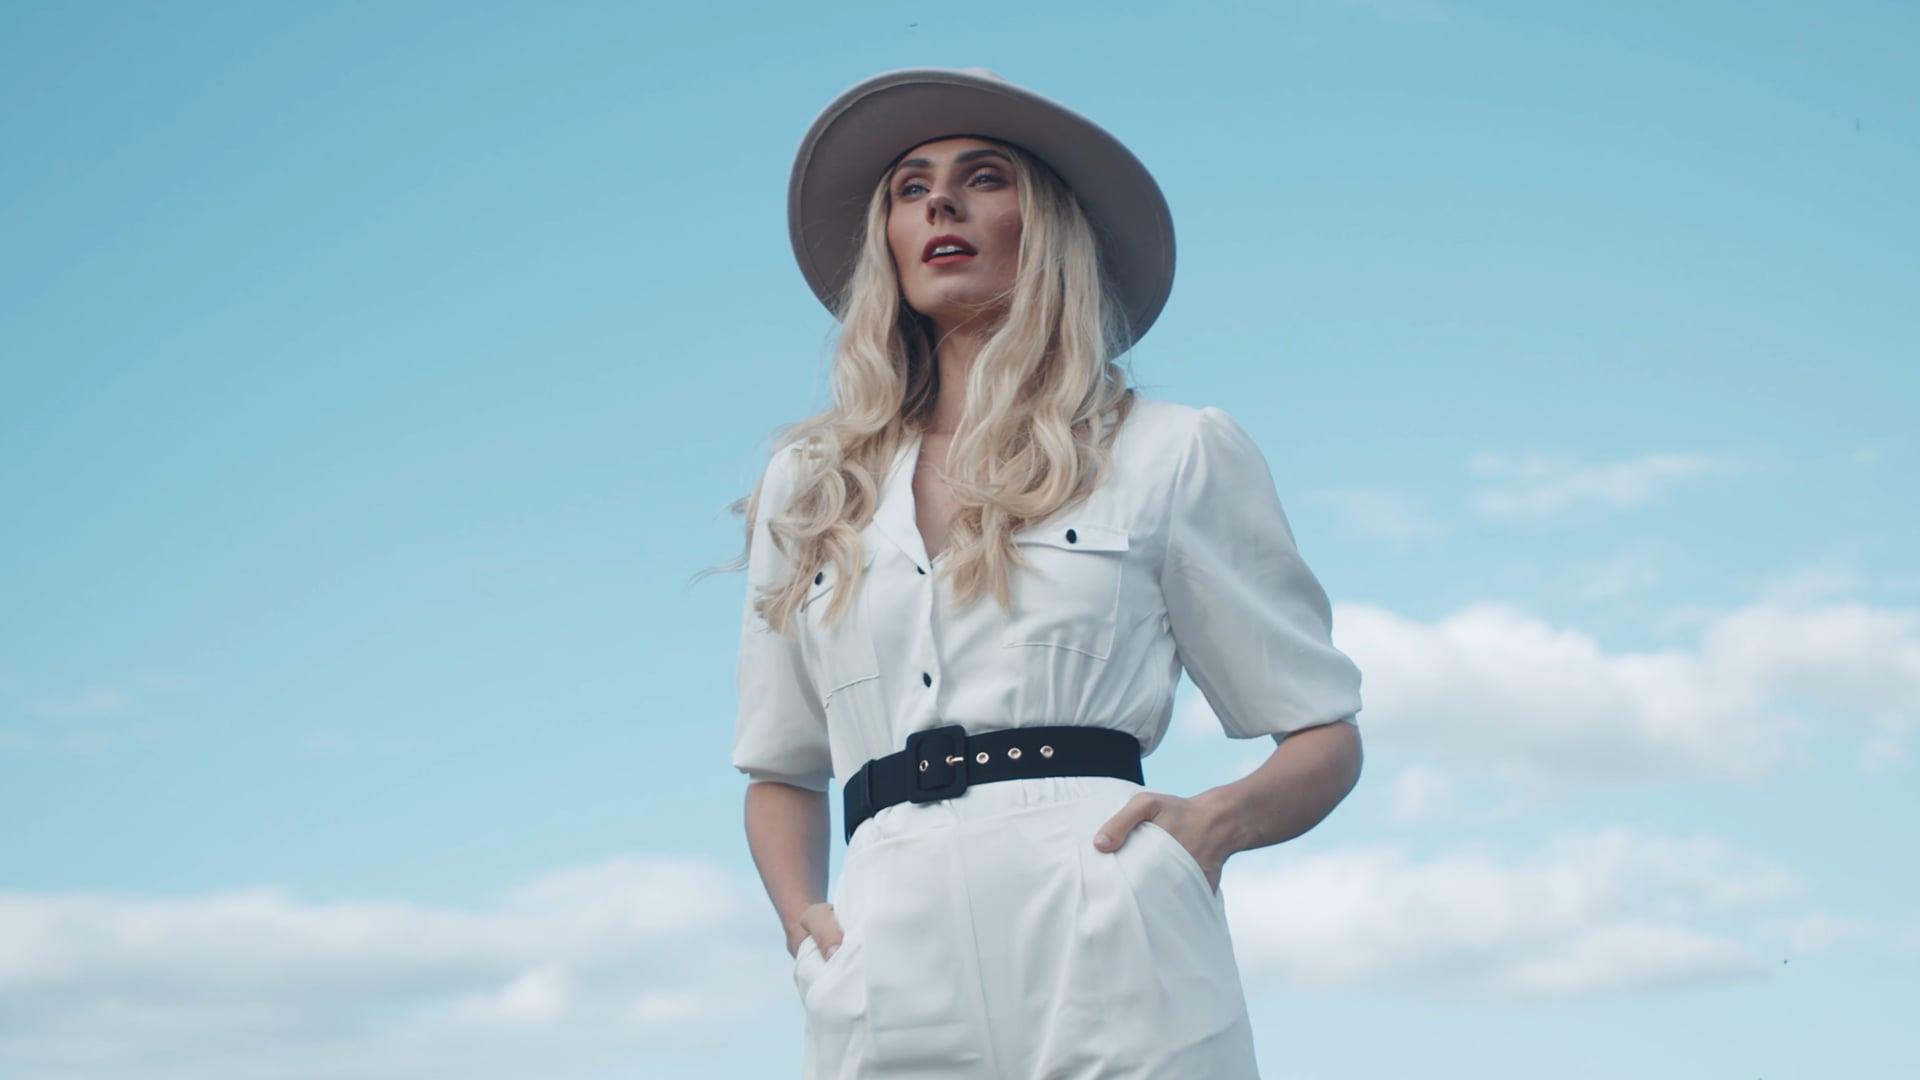 Little Mistress - Fashion Film BMPCC 4K